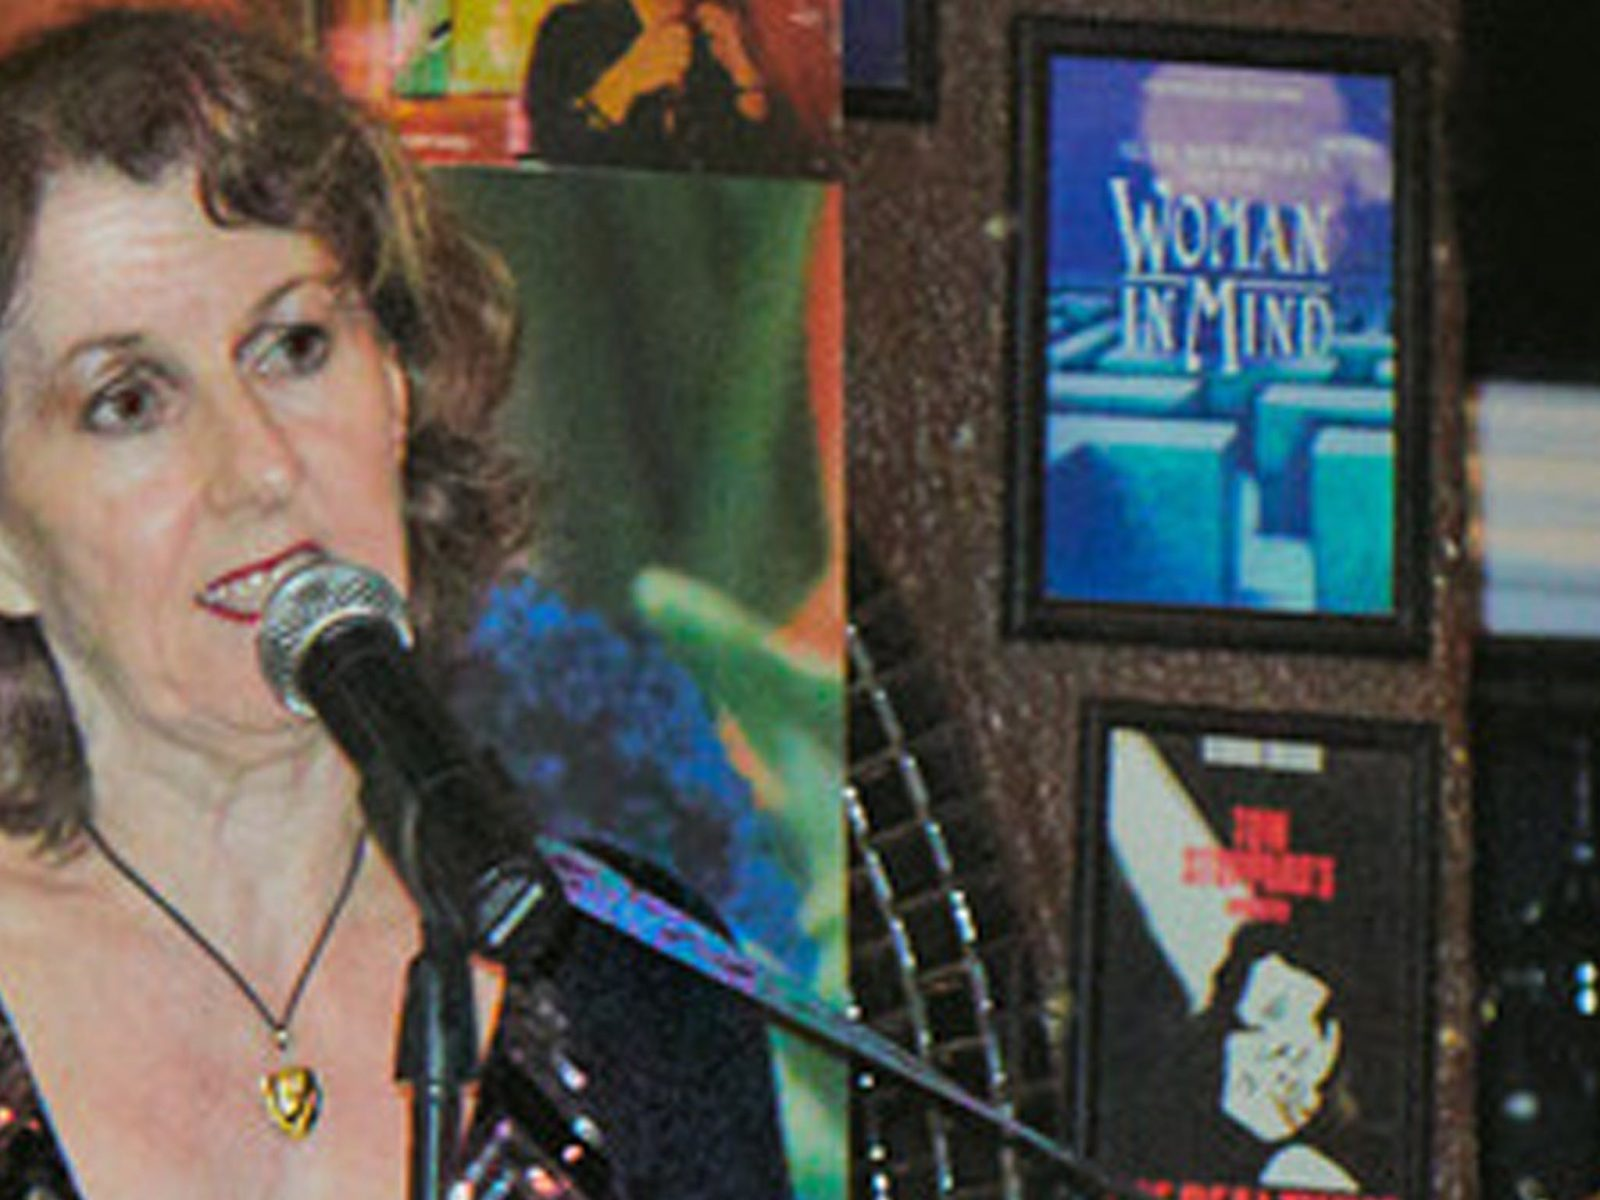 Karen J White sings songs of Kirsty MacColl